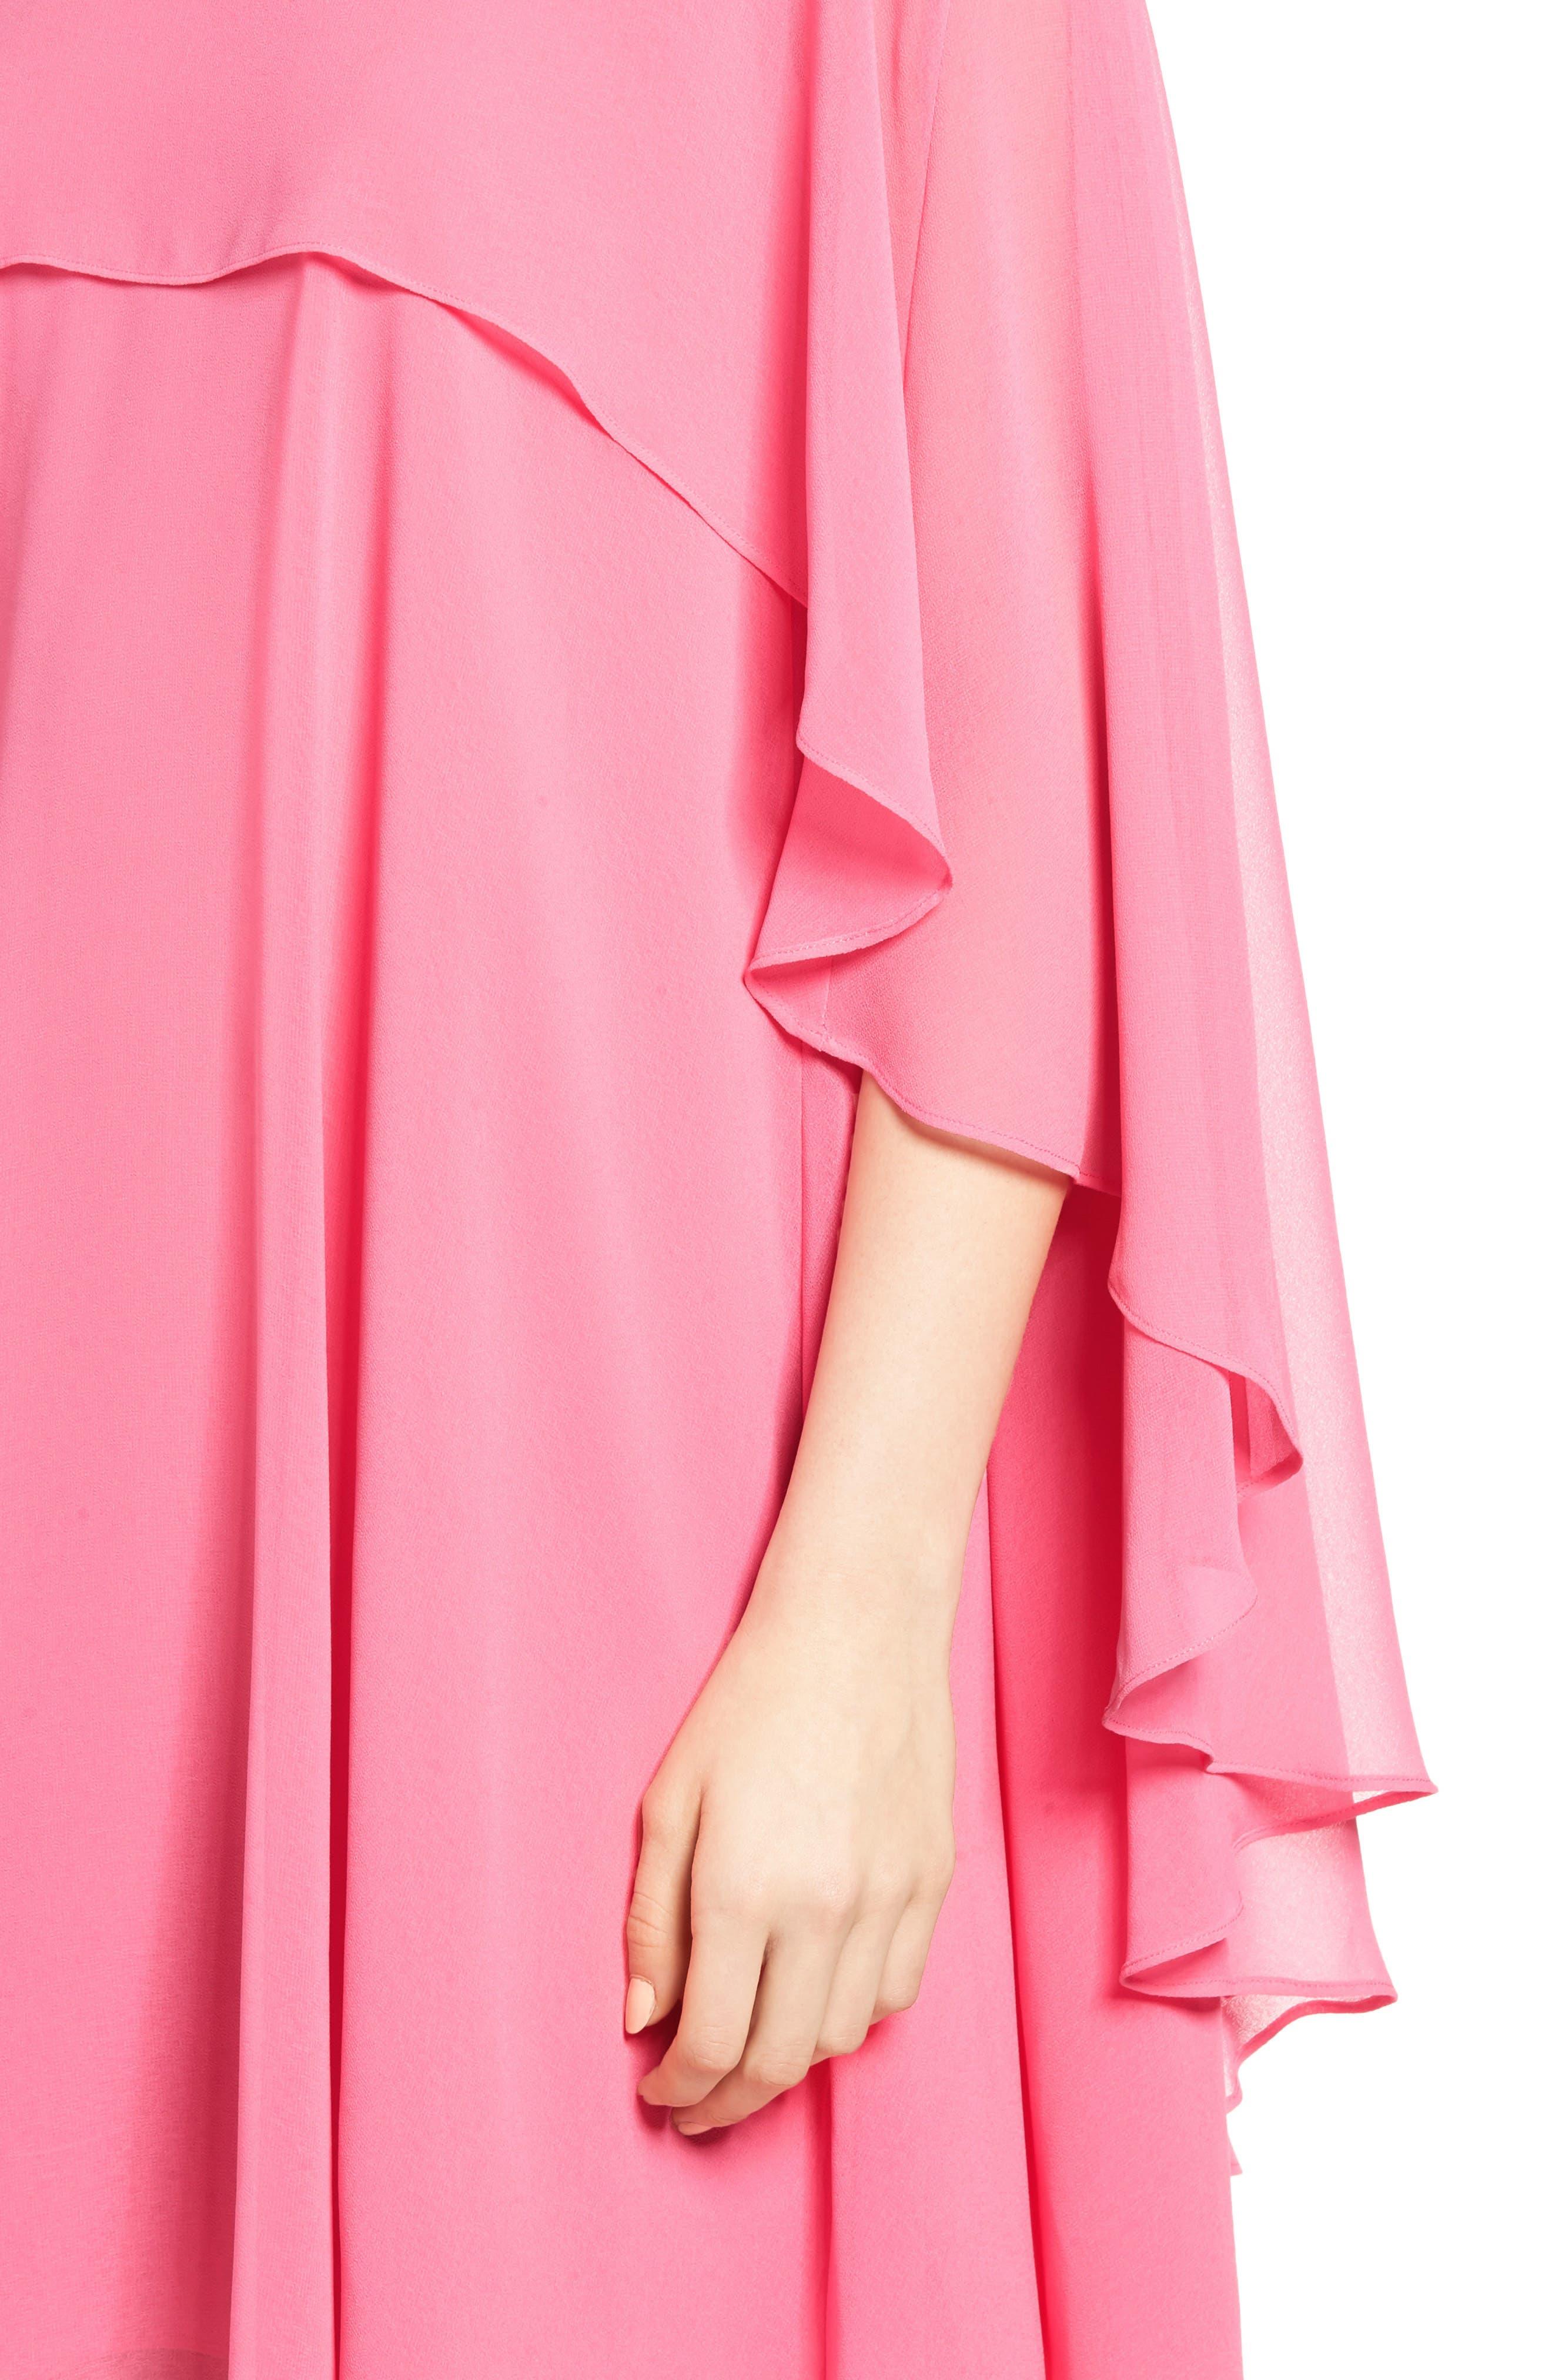 A-Line Chiffon Dress,                             Alternate thumbnail 4, color,                             Pink Zenna